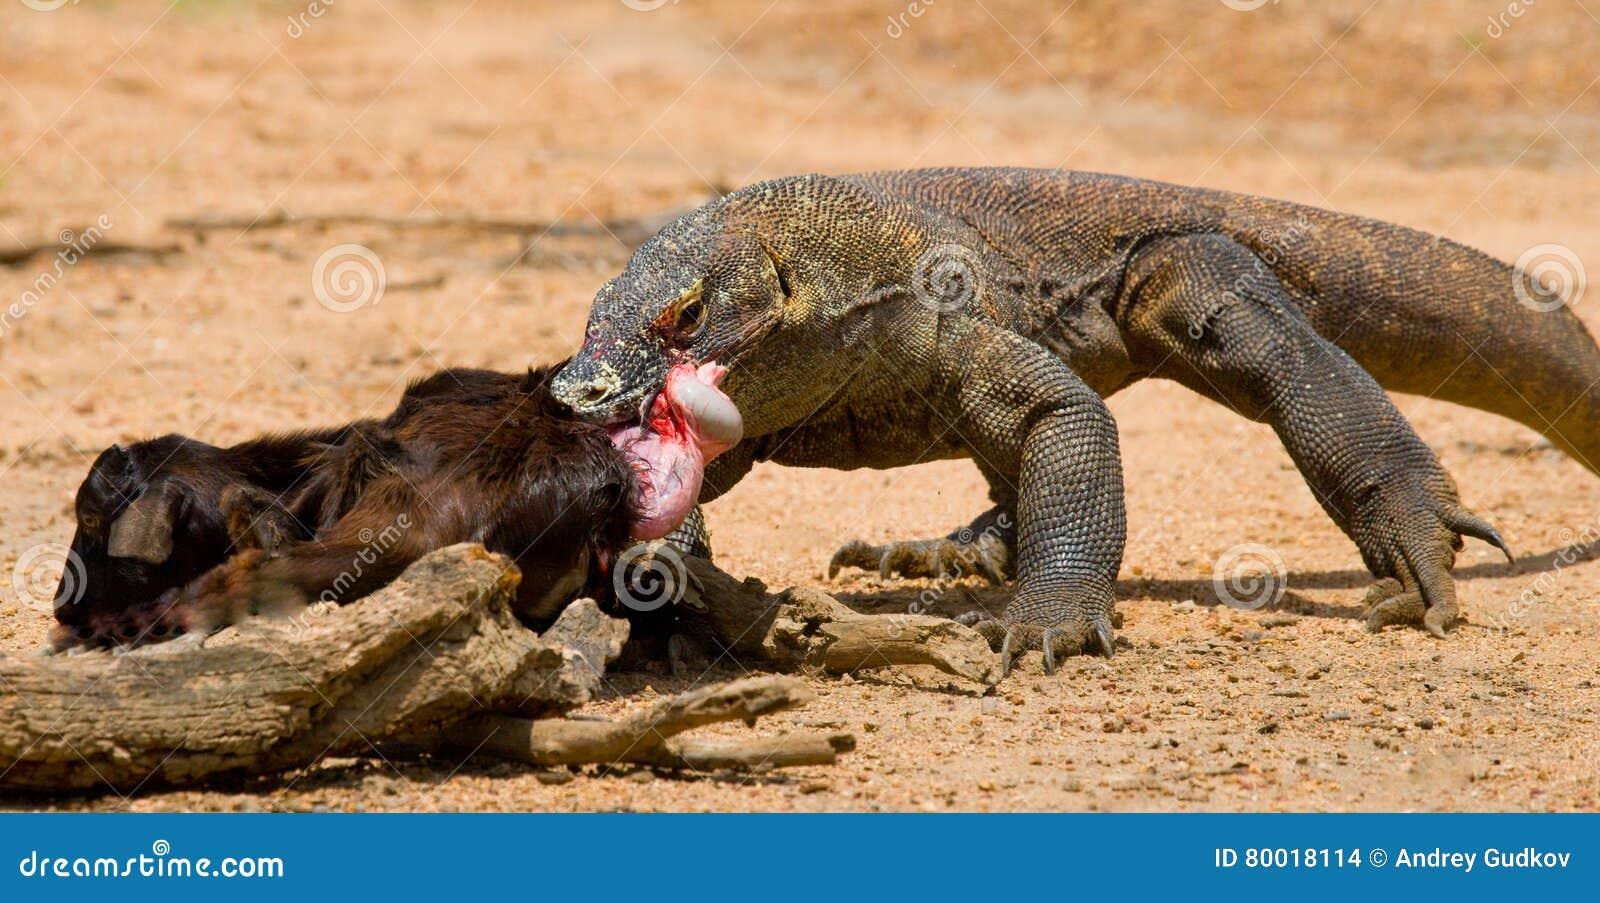 komodo dragons eat their prey indonesia komodo national park